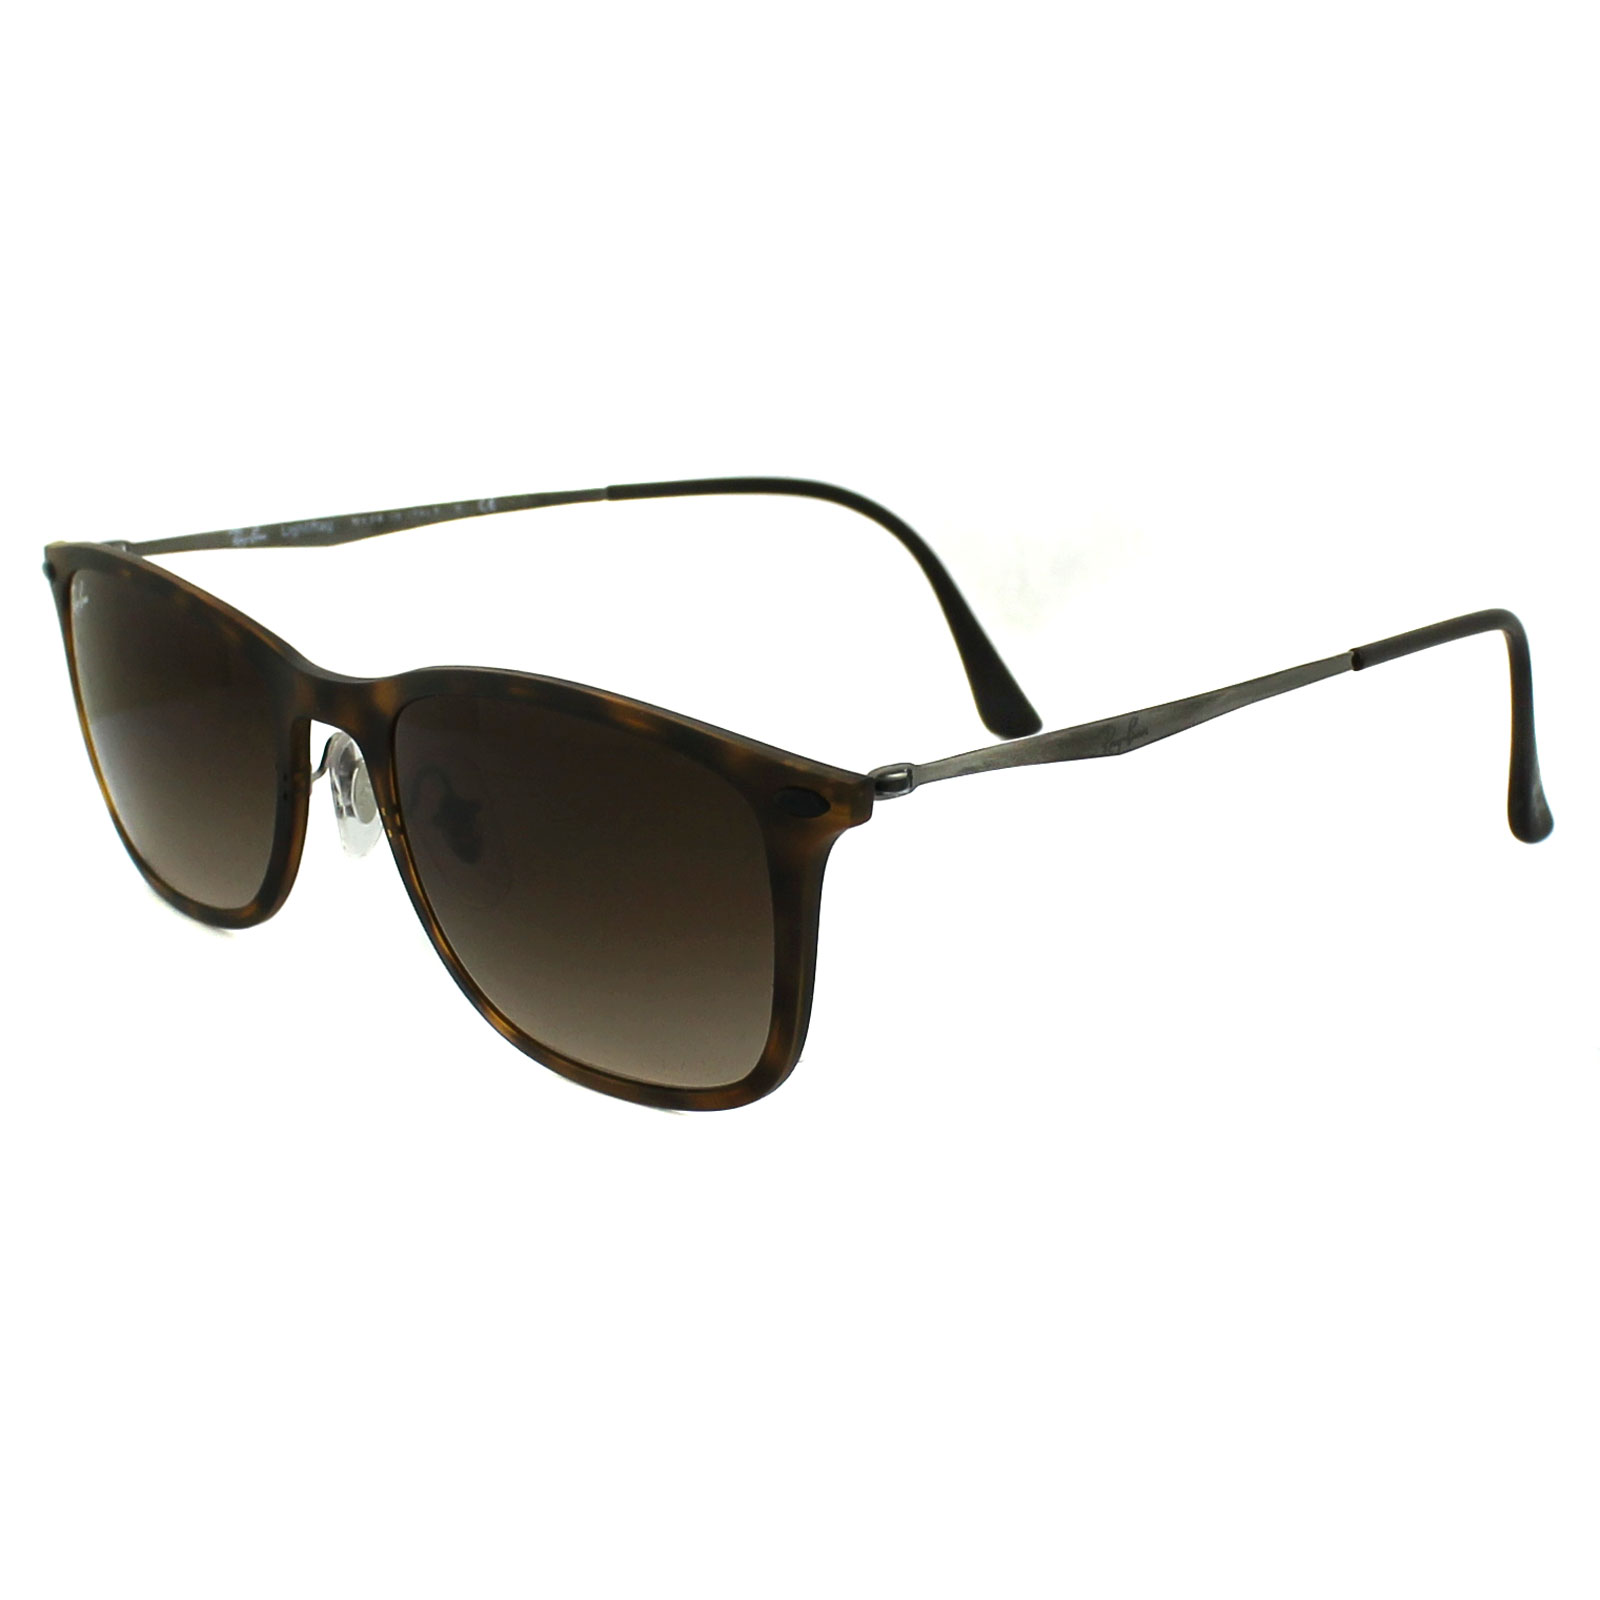 ray ban sunglasses new wayfarer  Ray-Ban Sunglasses New Wayfarer Light Ray 4225 894/13 Tortoise ...